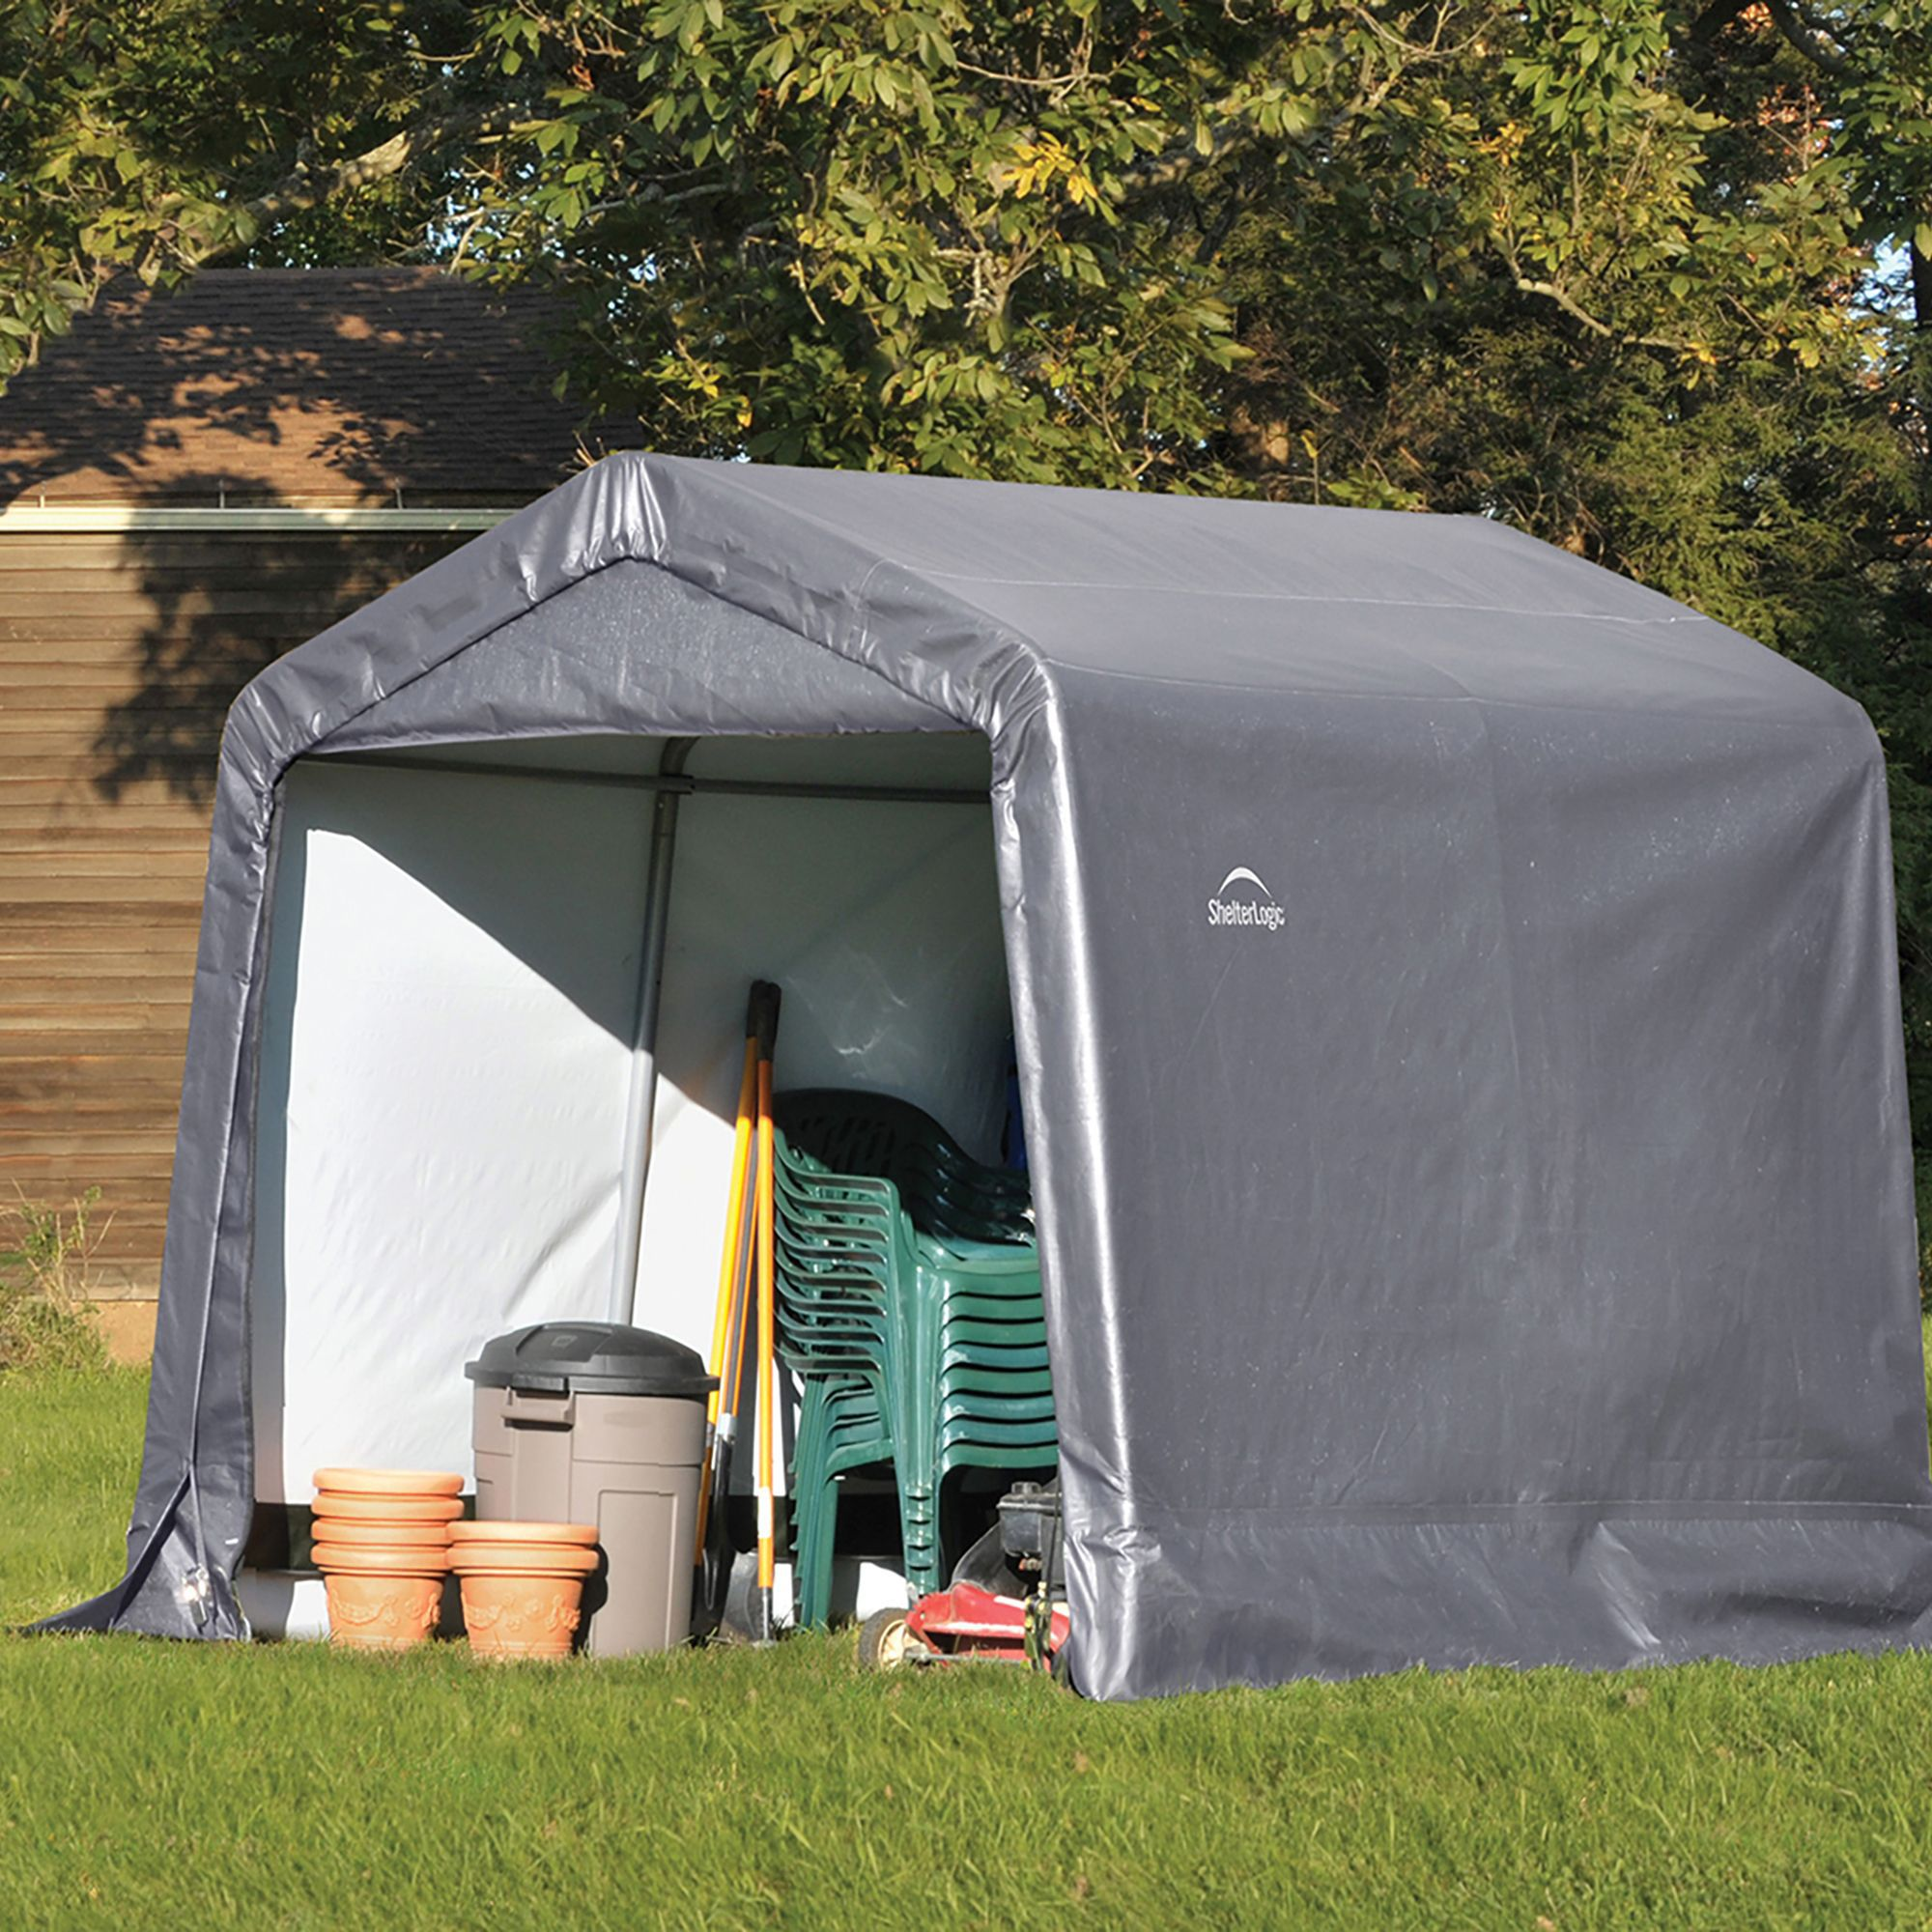 Shelterlogic & Sheds Cabins u0026 Summerhouses | Outdoor u0026 Garden